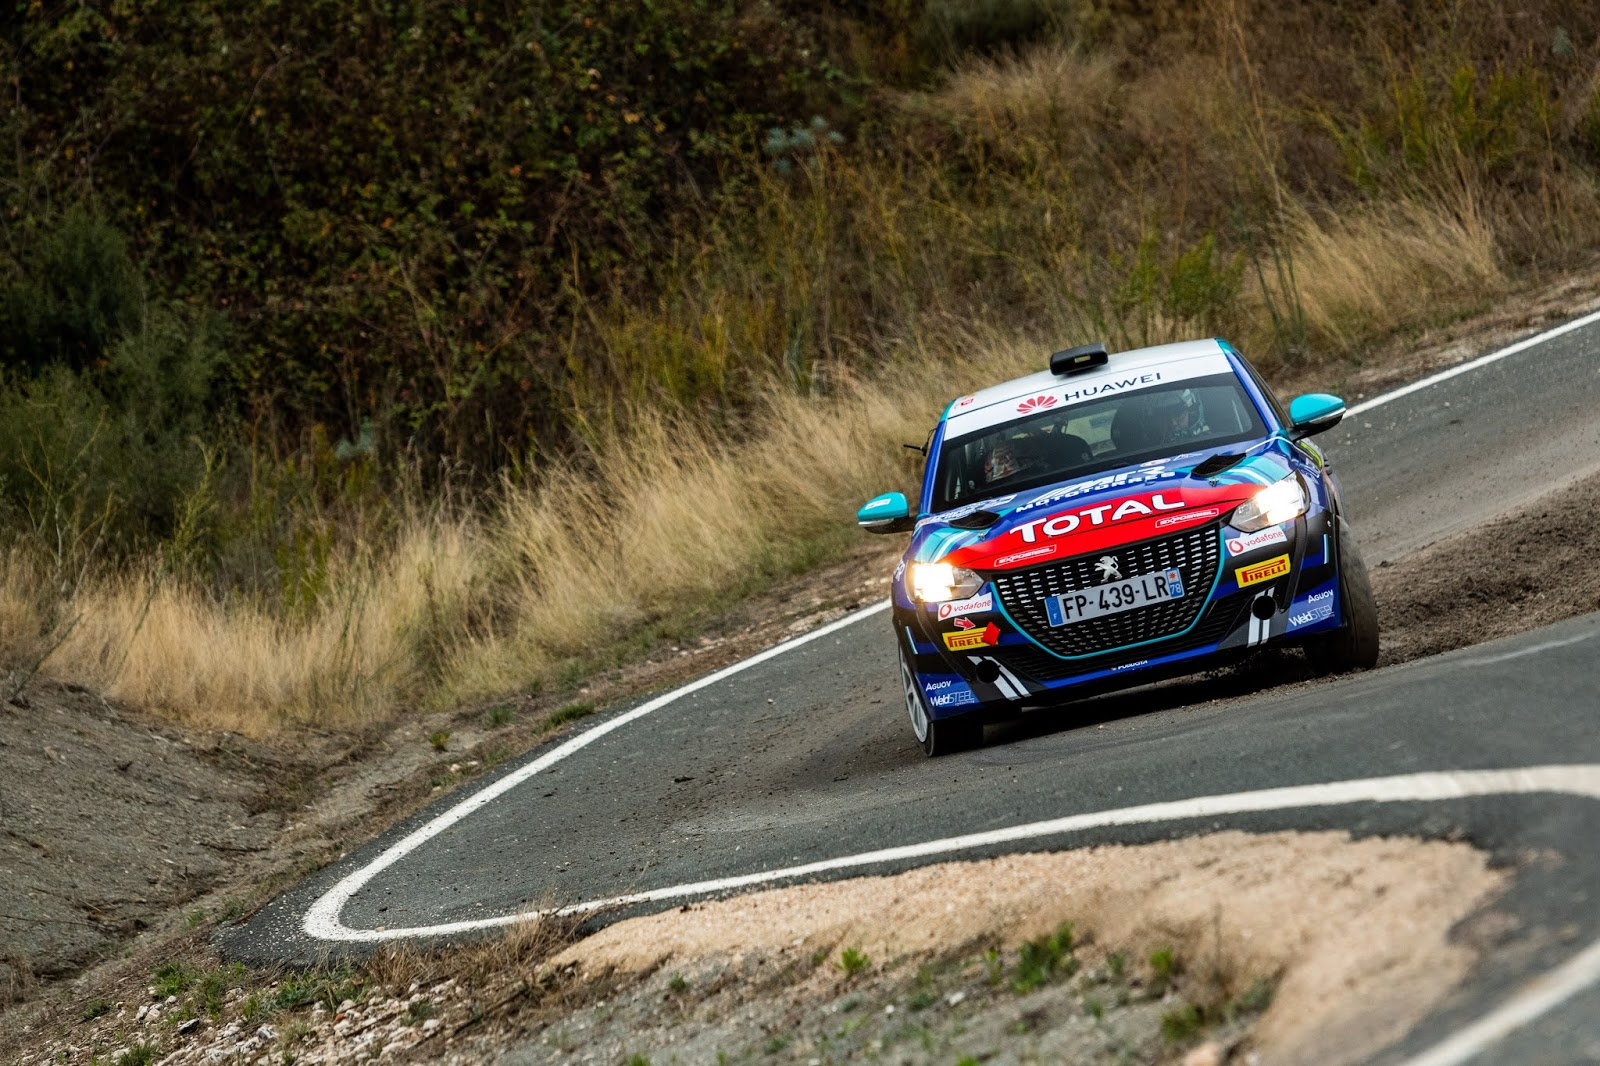 peugeot 40 0 Peugeot Sport : Δυνατό ξεκίνημα για το 208 Rally 4 Peugeot, Peugeot 208, Rally, αγωνες, ειδήσεις